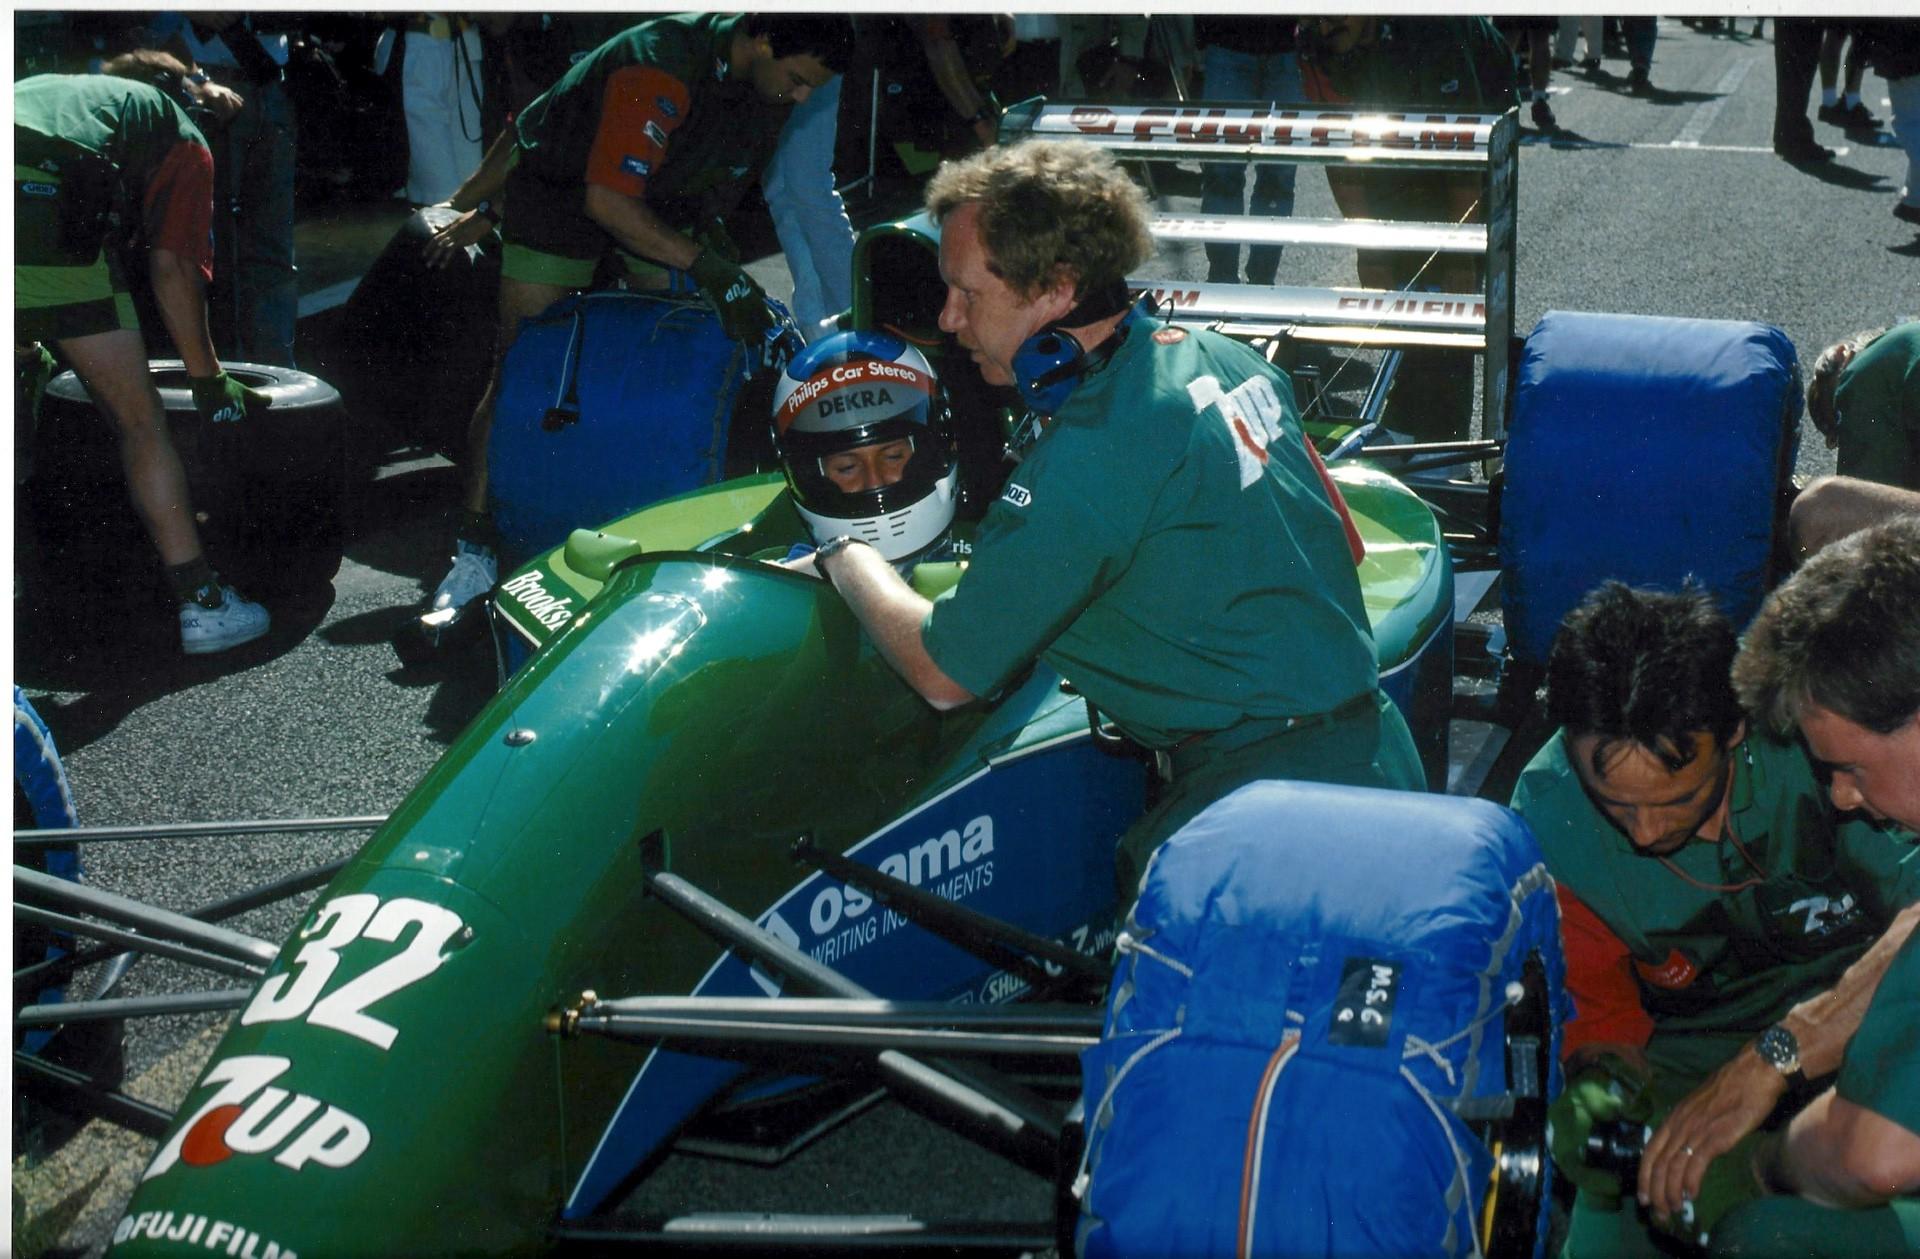 Michael_Schumacher_Jordan_F1_debut-0009